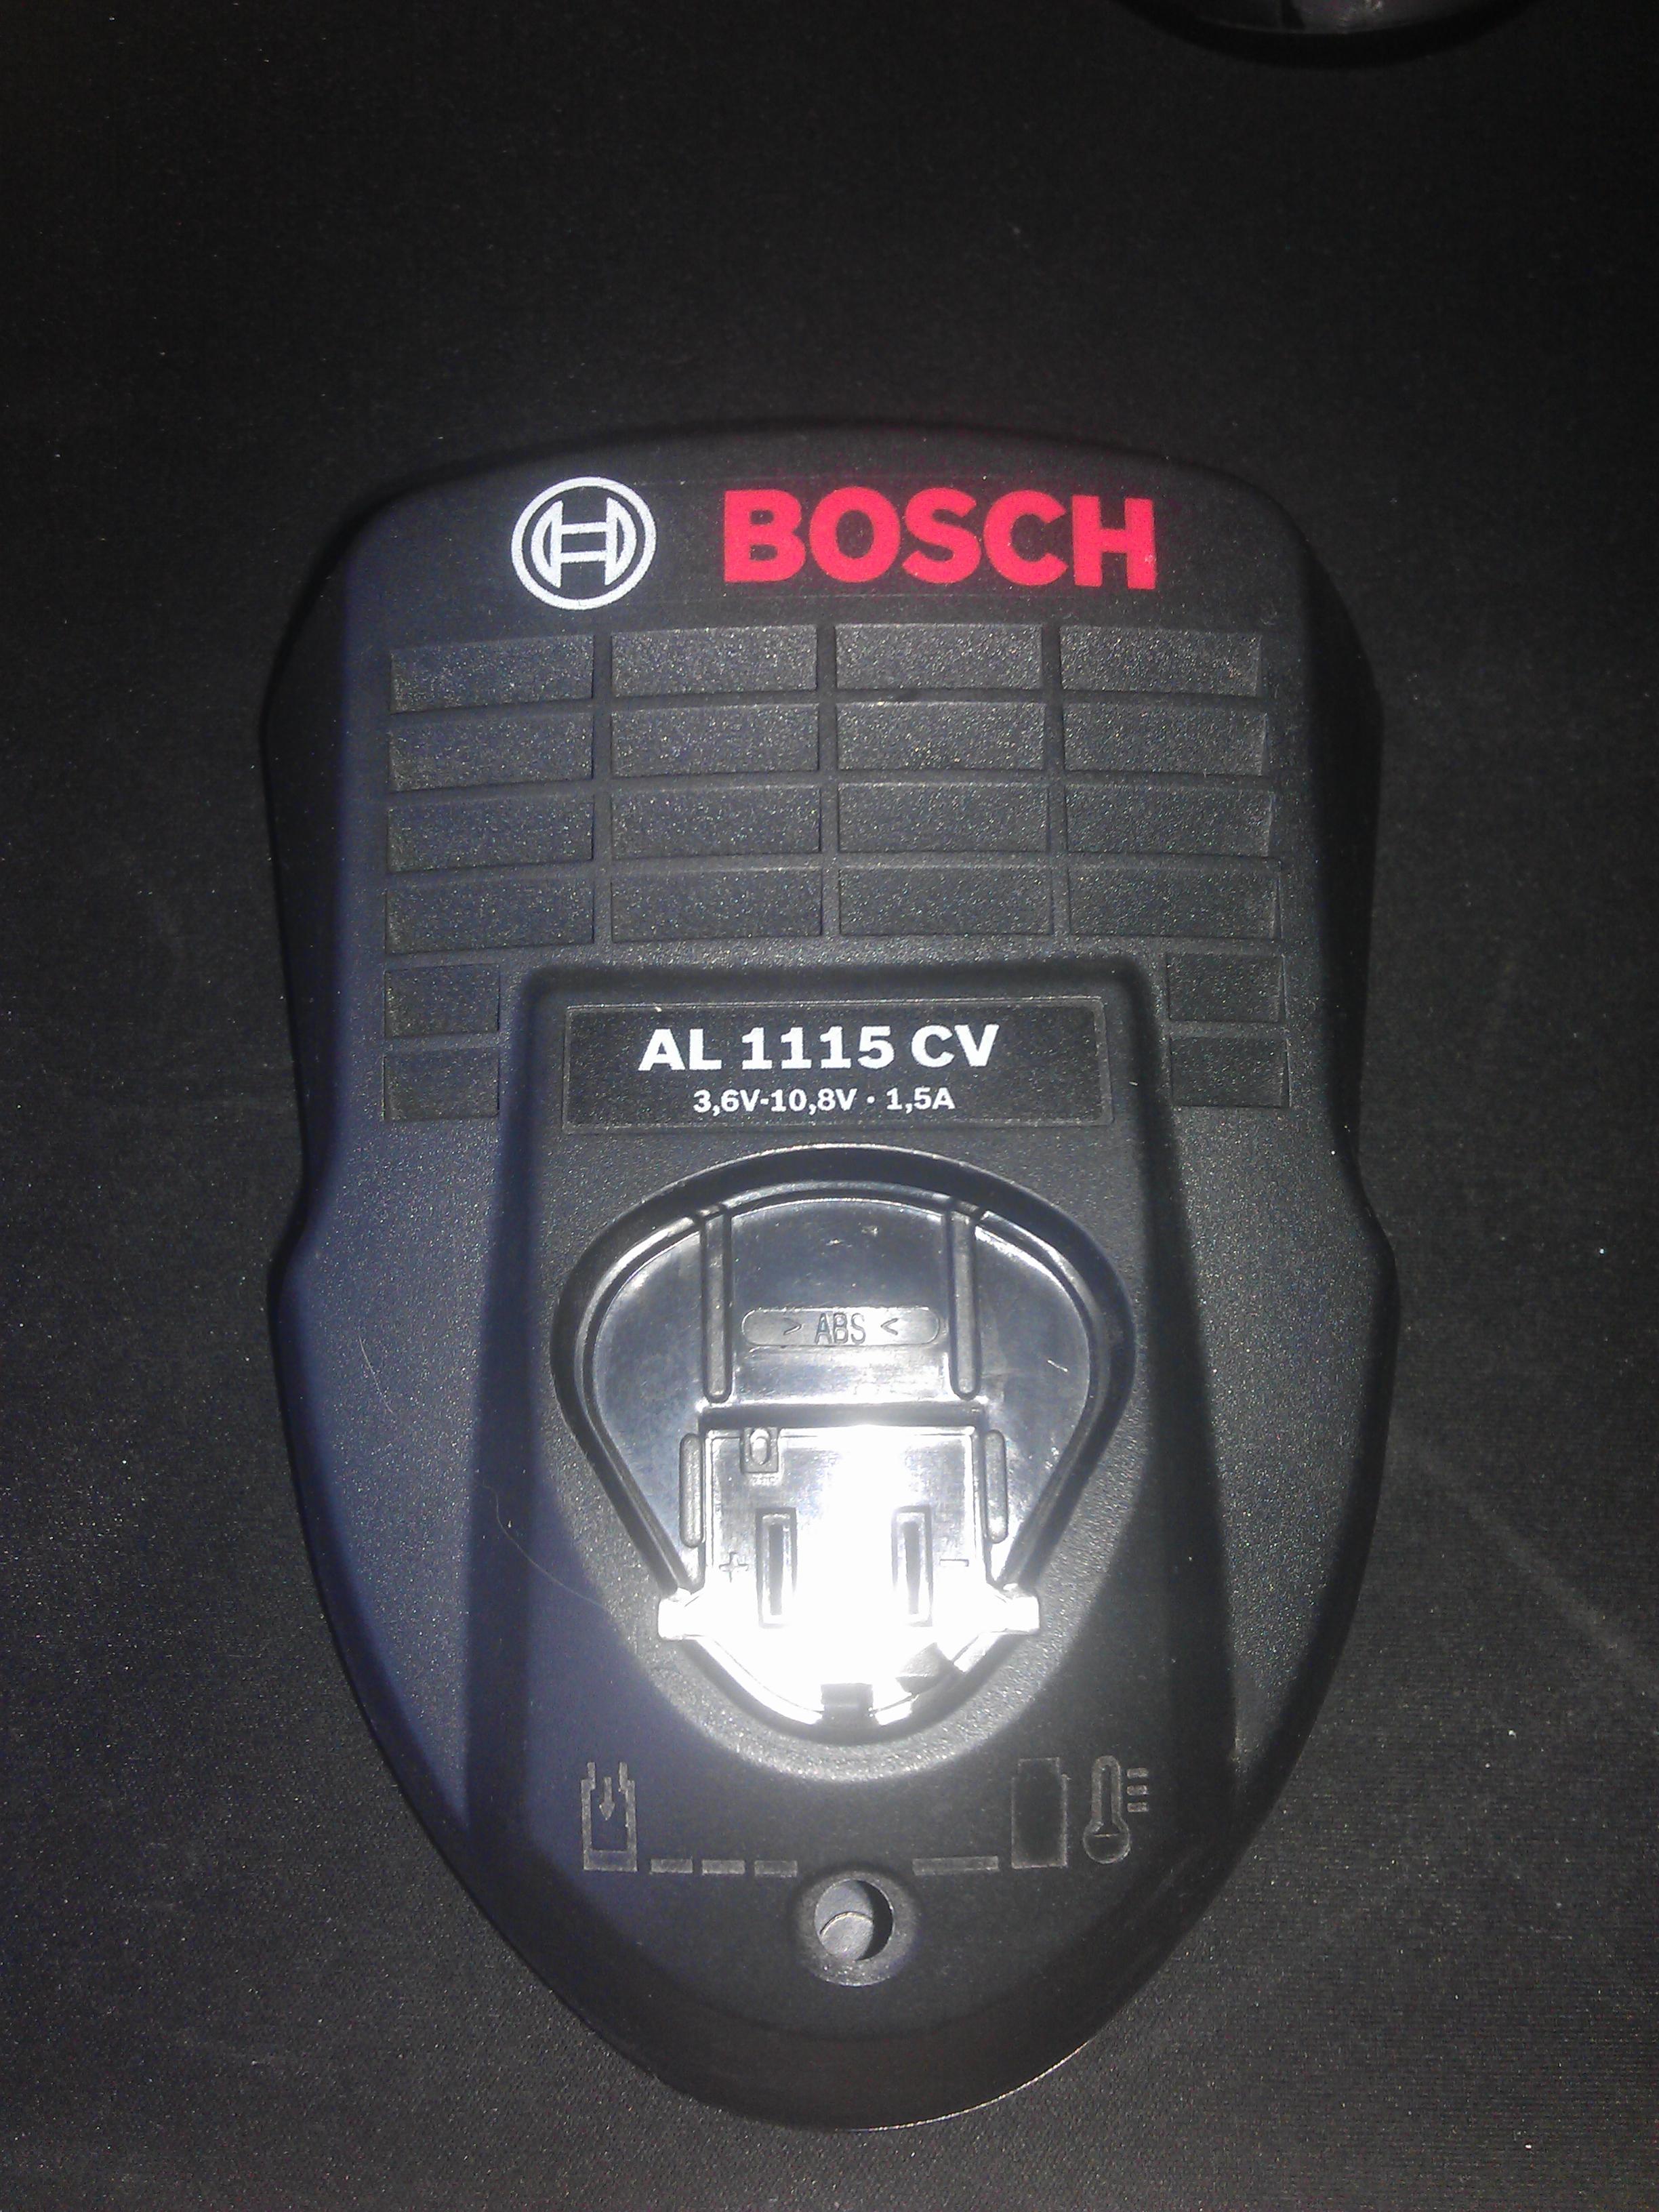 Bosch AL 1115 CV - Natychmiast pali bezpiecznik.